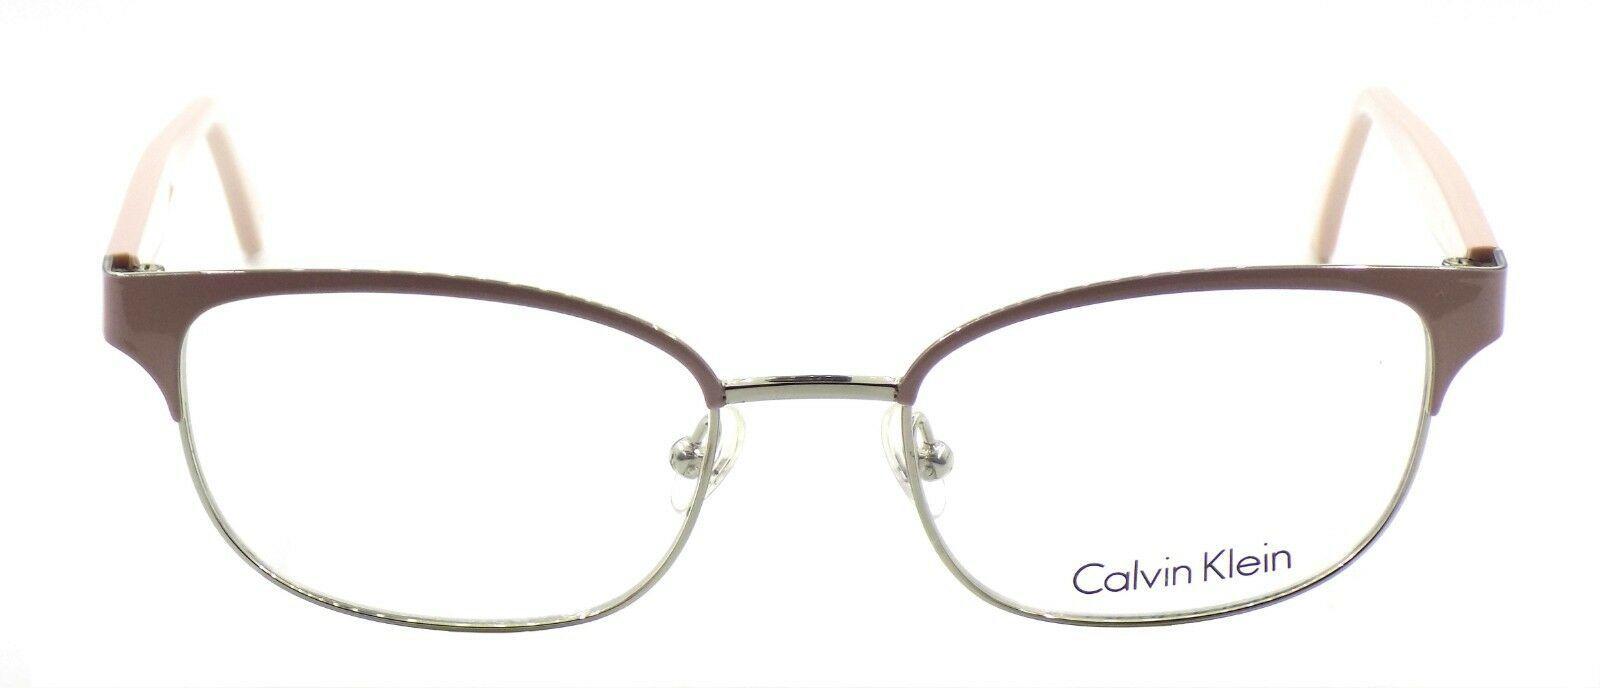 Calvin Klein CK5445 608 Women's Eyeglasses Frames Cosmetic Pink 51-18-135 + CASE